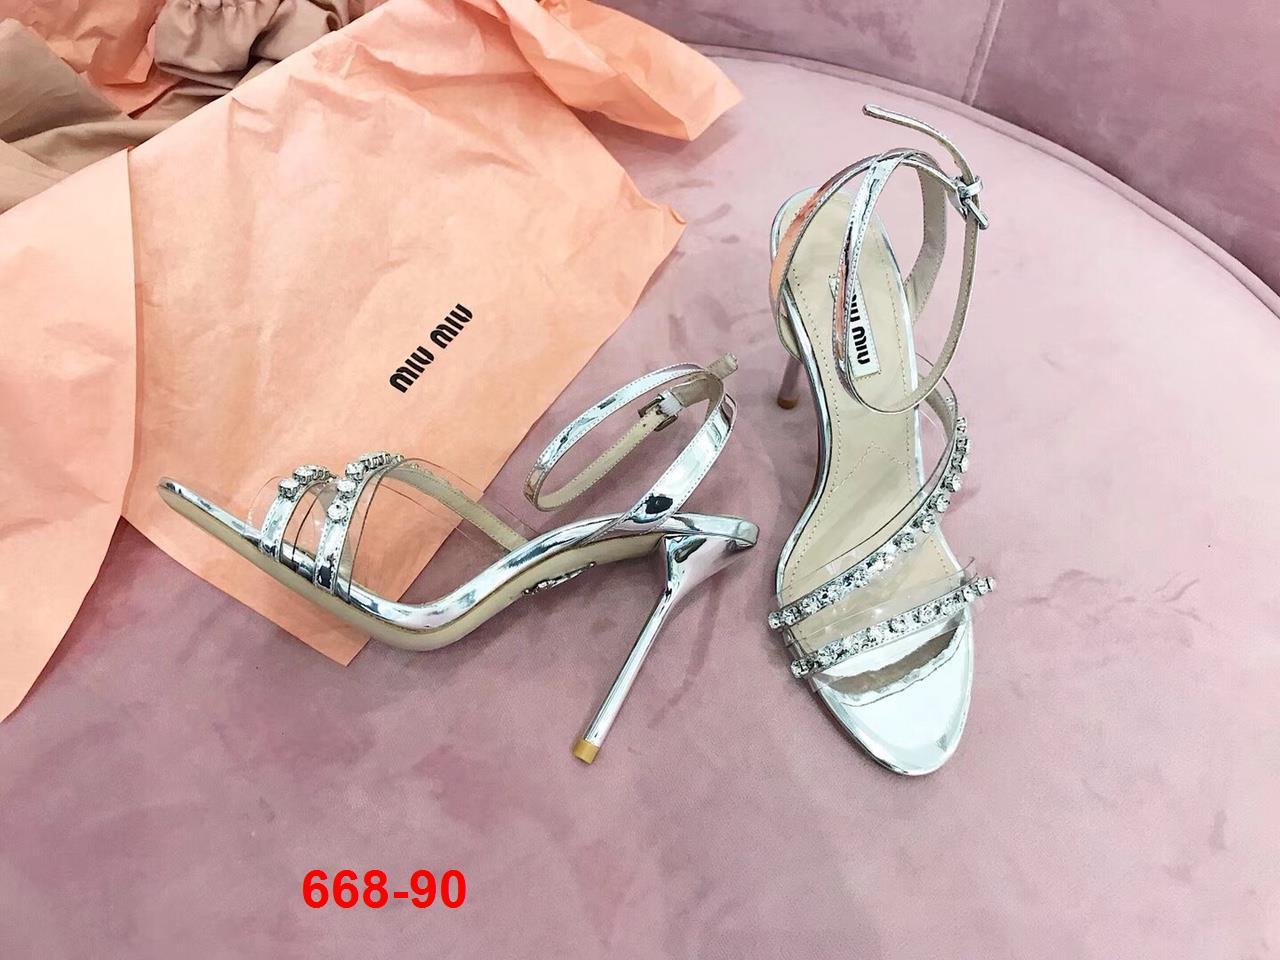 668-90 Miu Miu sandal cao 11cm siêu cấp